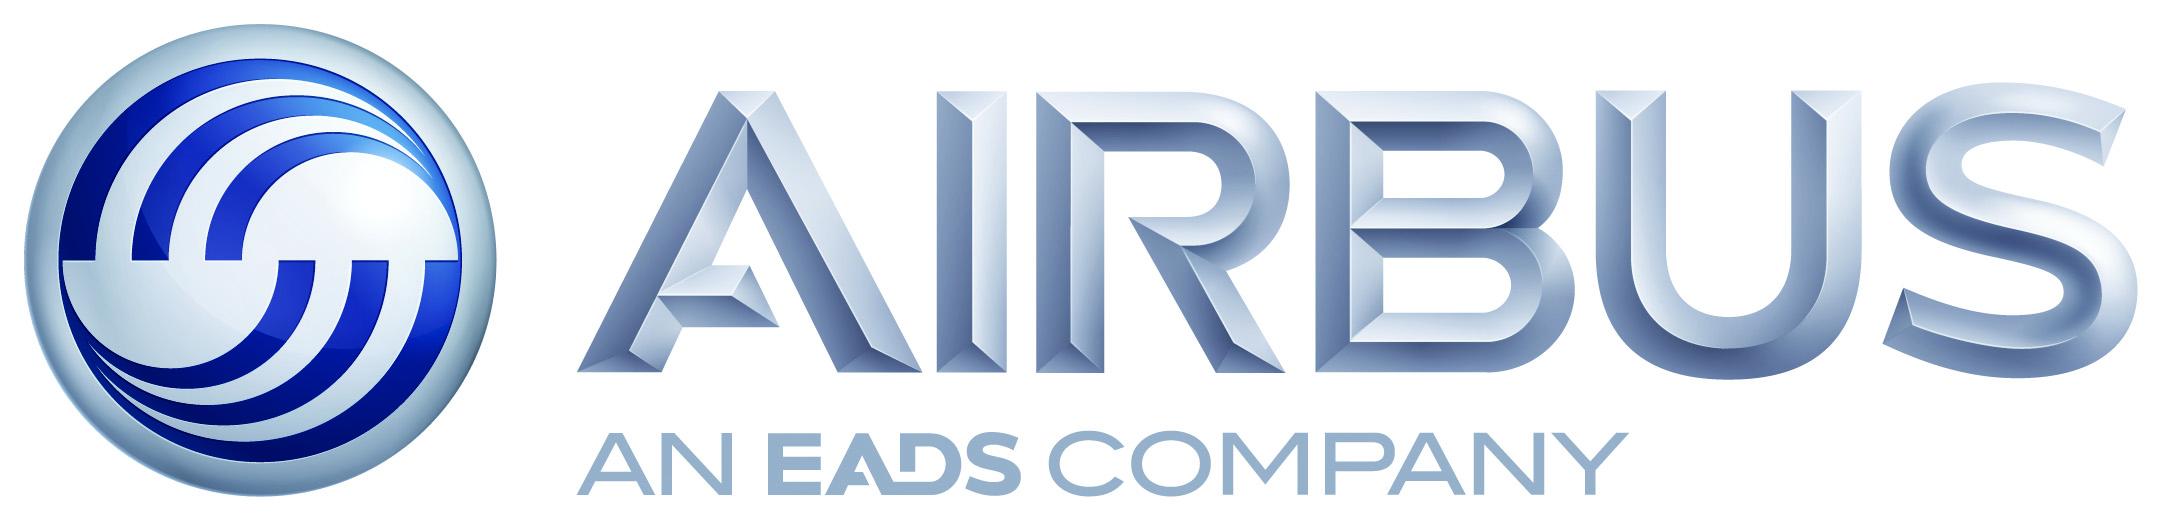 https://i2.wp.com/www.defesaaereanaval.com.br/wp-content/uploads/2014/04/airbus-logo.jpg